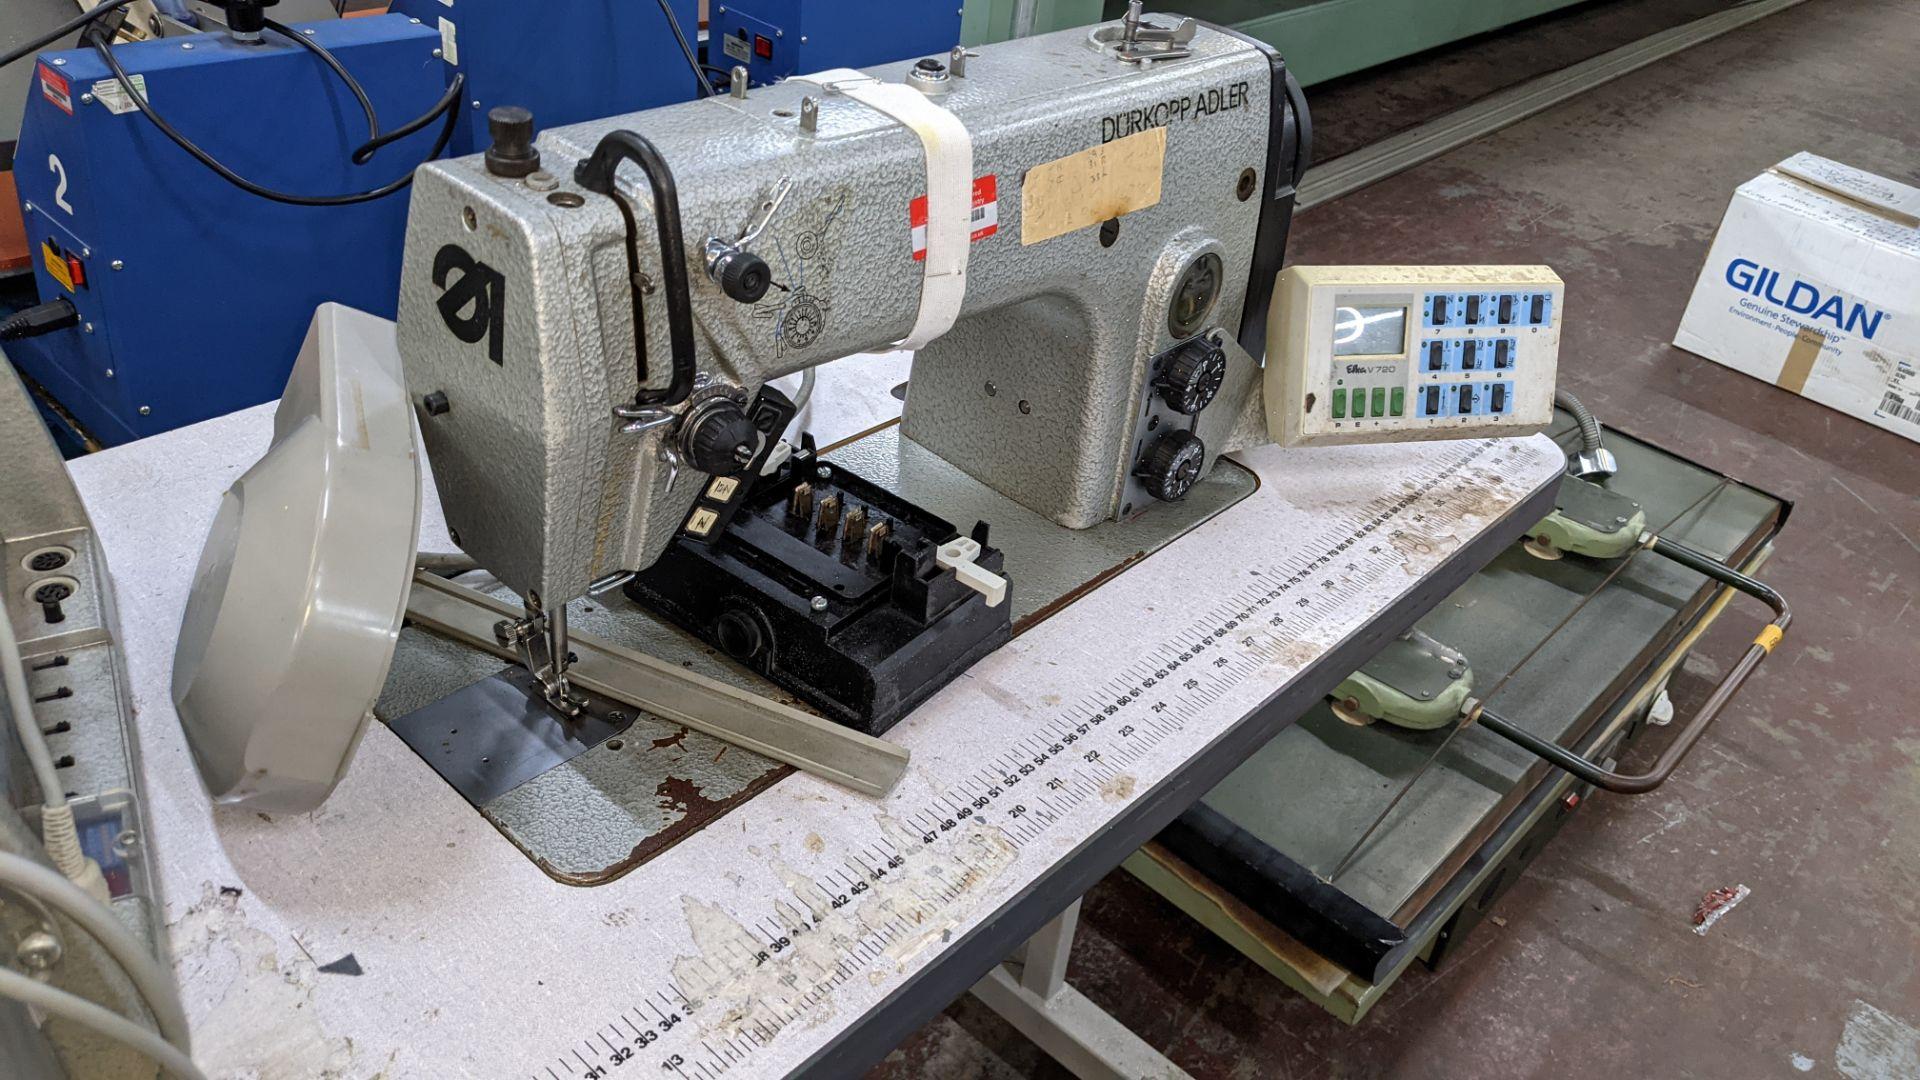 Durkopp Adler type 0271-L40042 sewing machine - Image 8 of 19